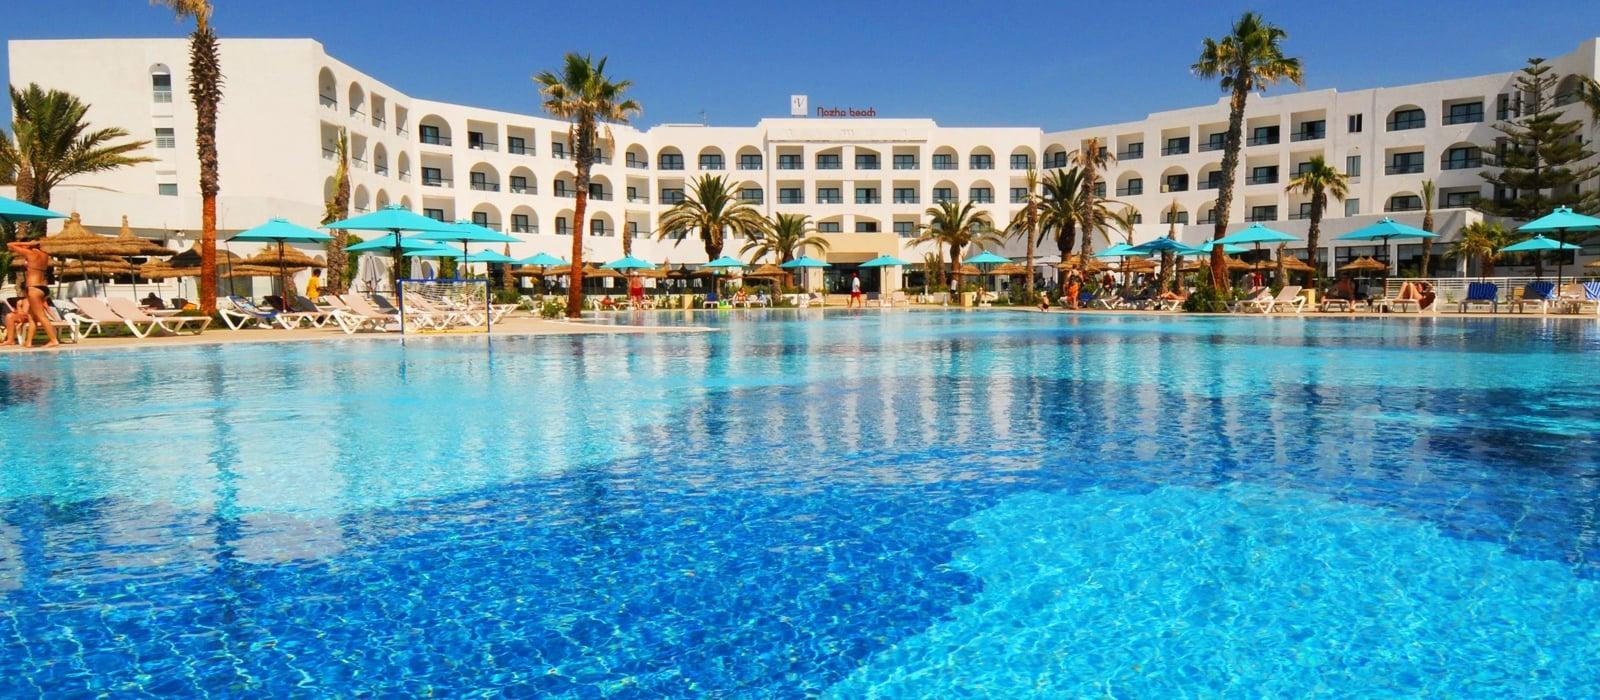 Pisicina Exterior - Hamammet Nozha Beach Hotel